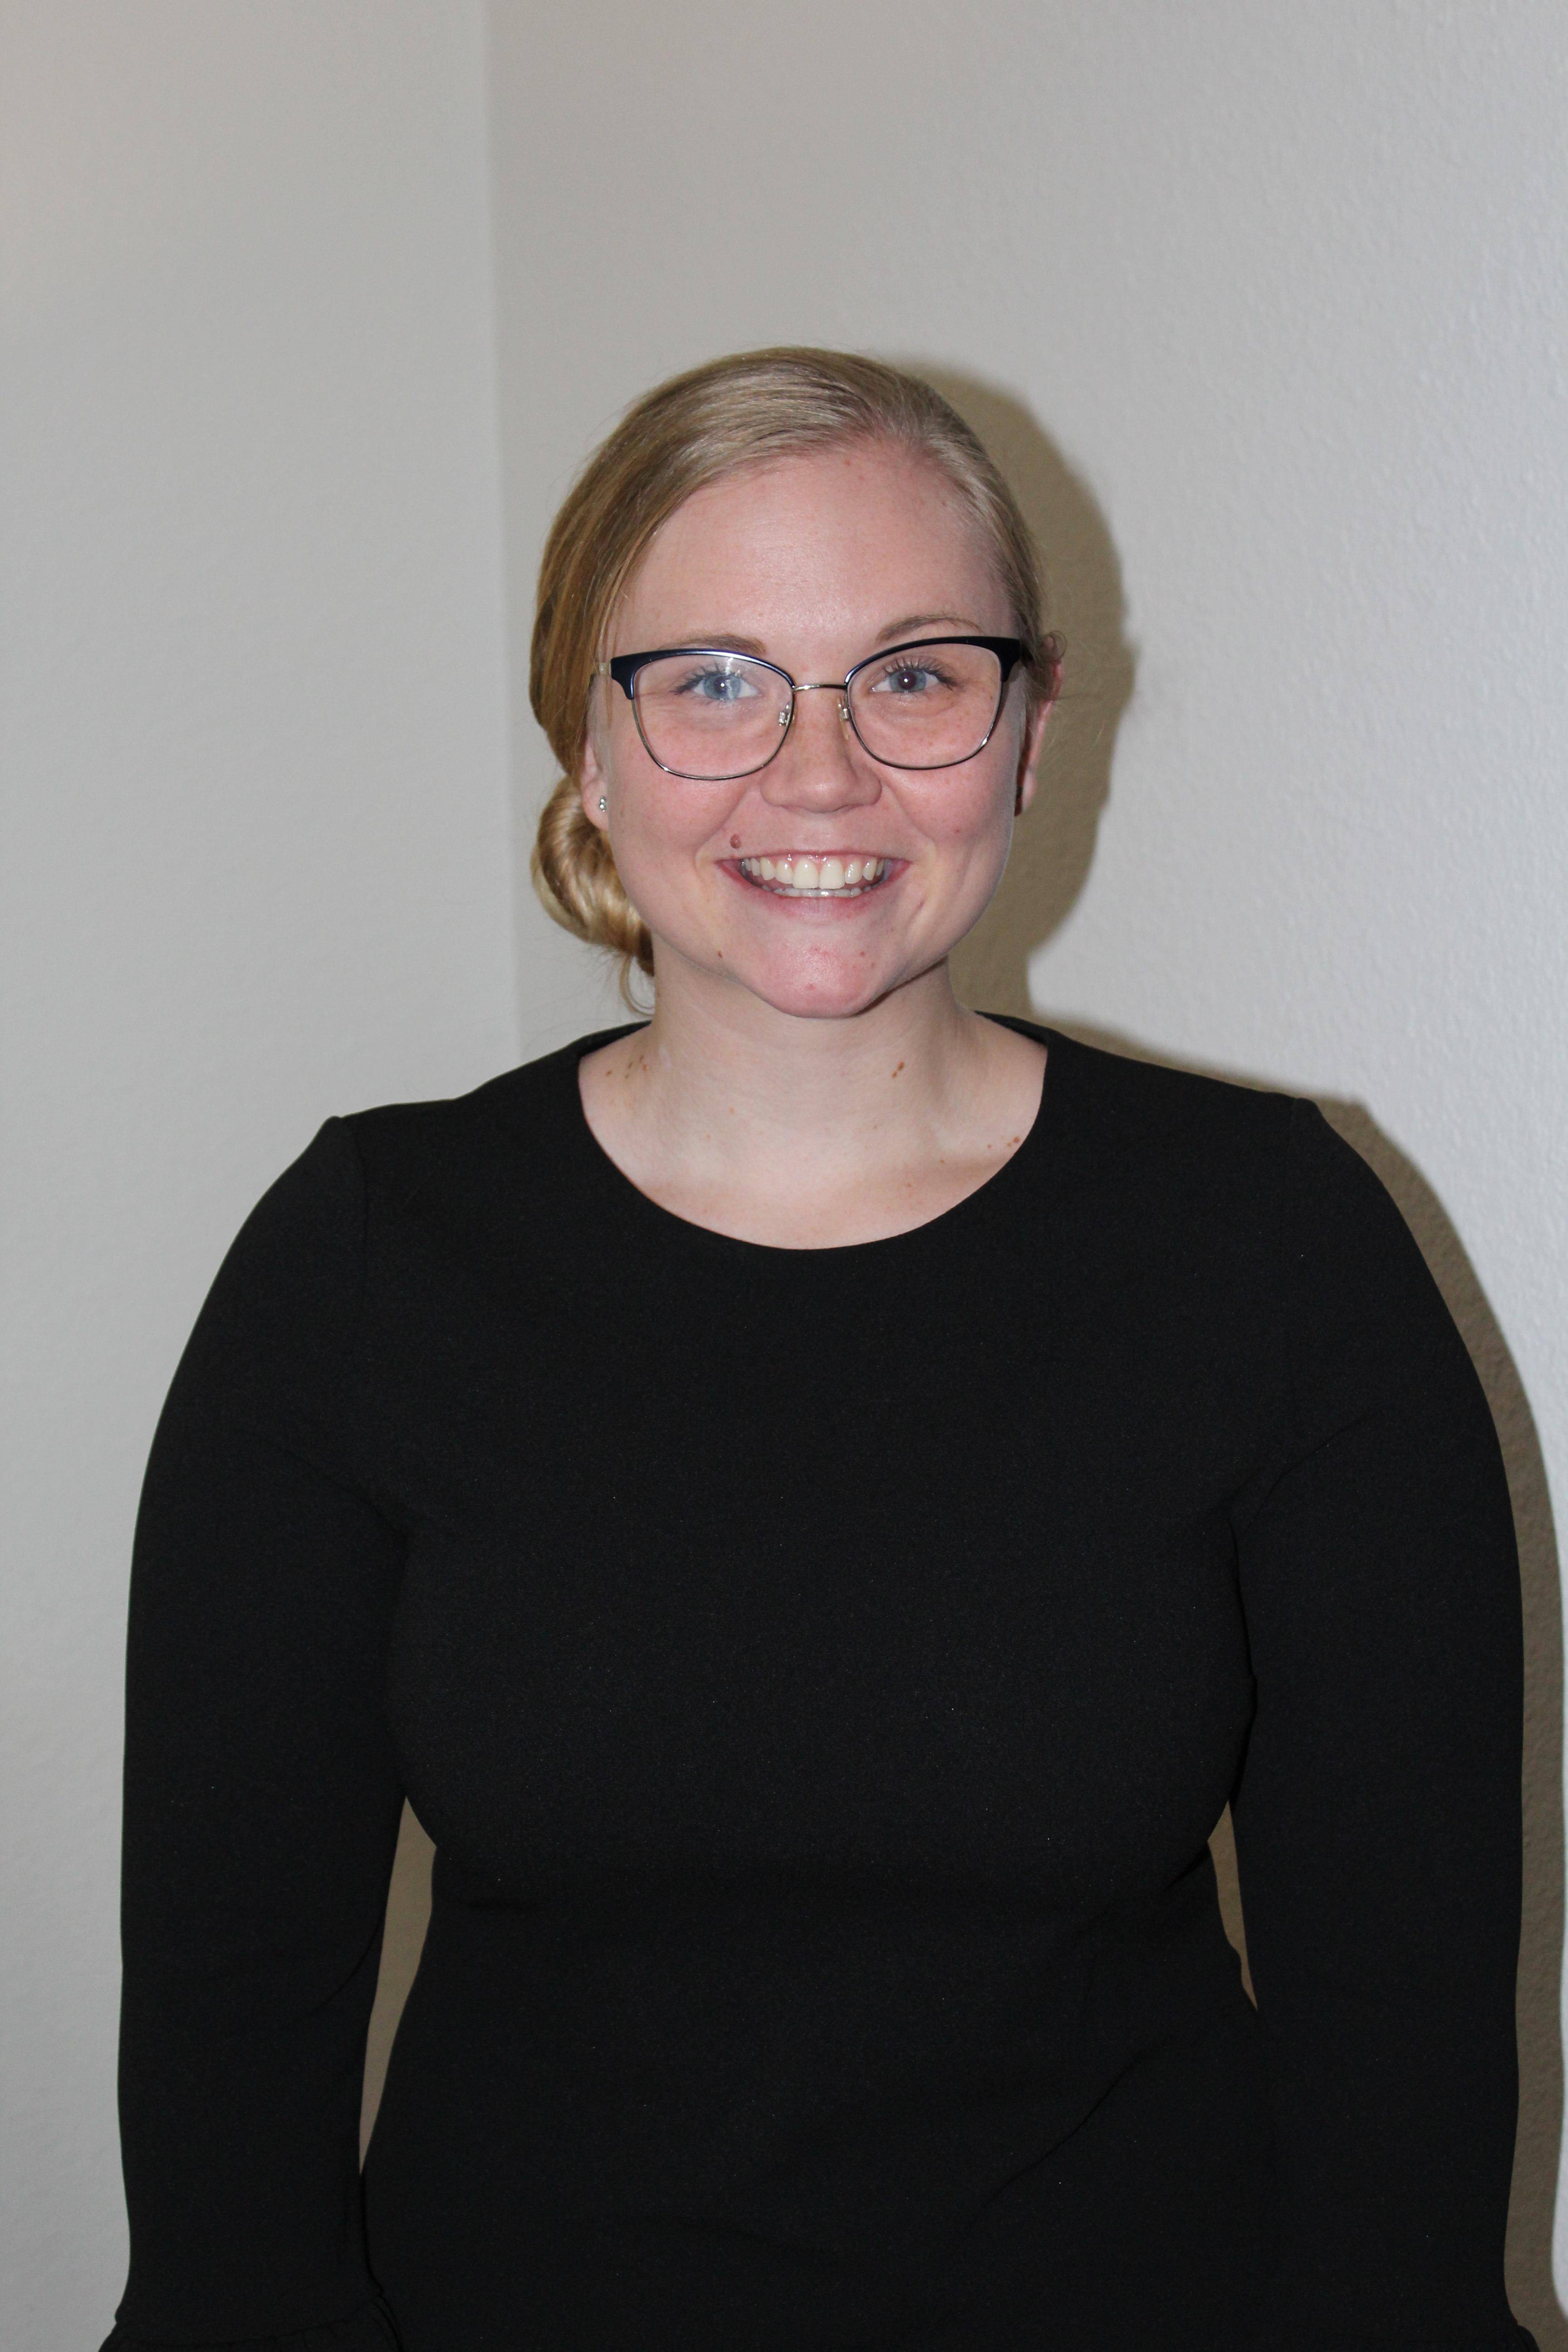 Melissa Biddle